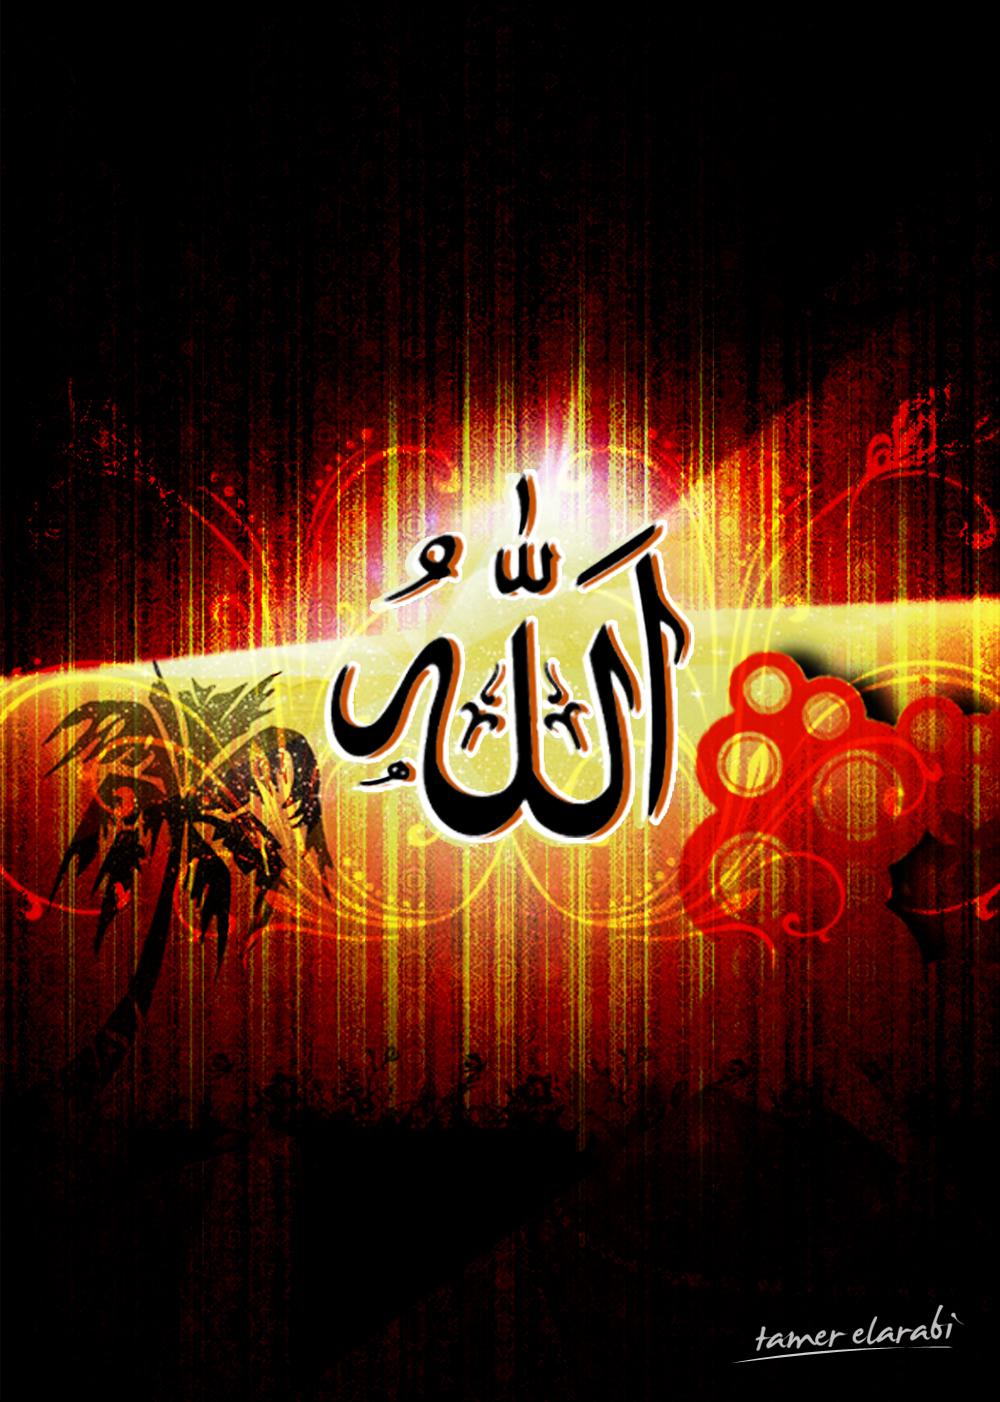 Wallpaper Lafadz Allah : wallpaper, lafadz, allah, Insha, Allah, 1000x1402, Download, Wallpaper, WallpaperTip